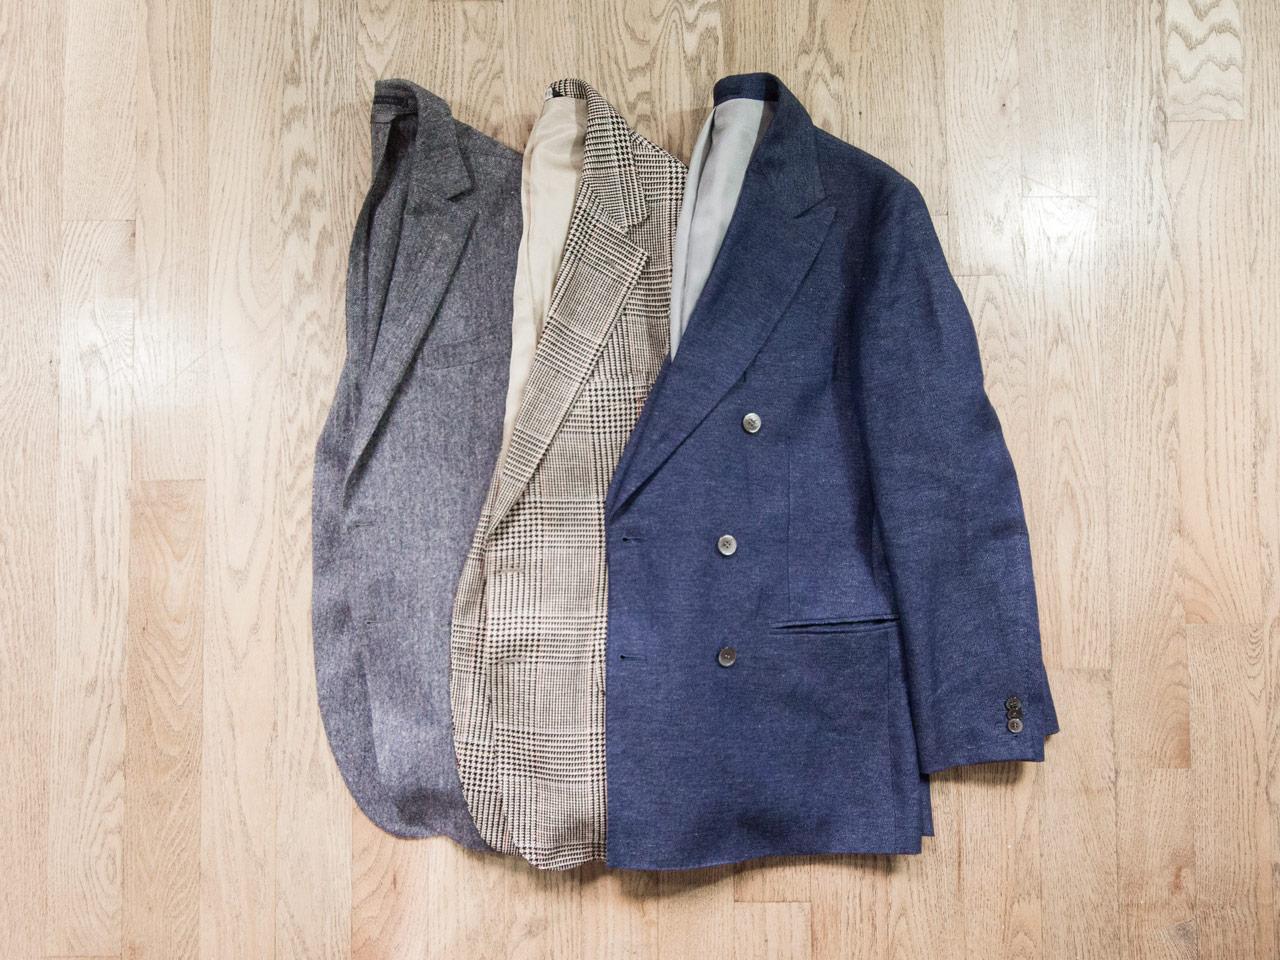 Men 39 s wardrobe essentials the clothes a man needs in his for Minimalist essentials